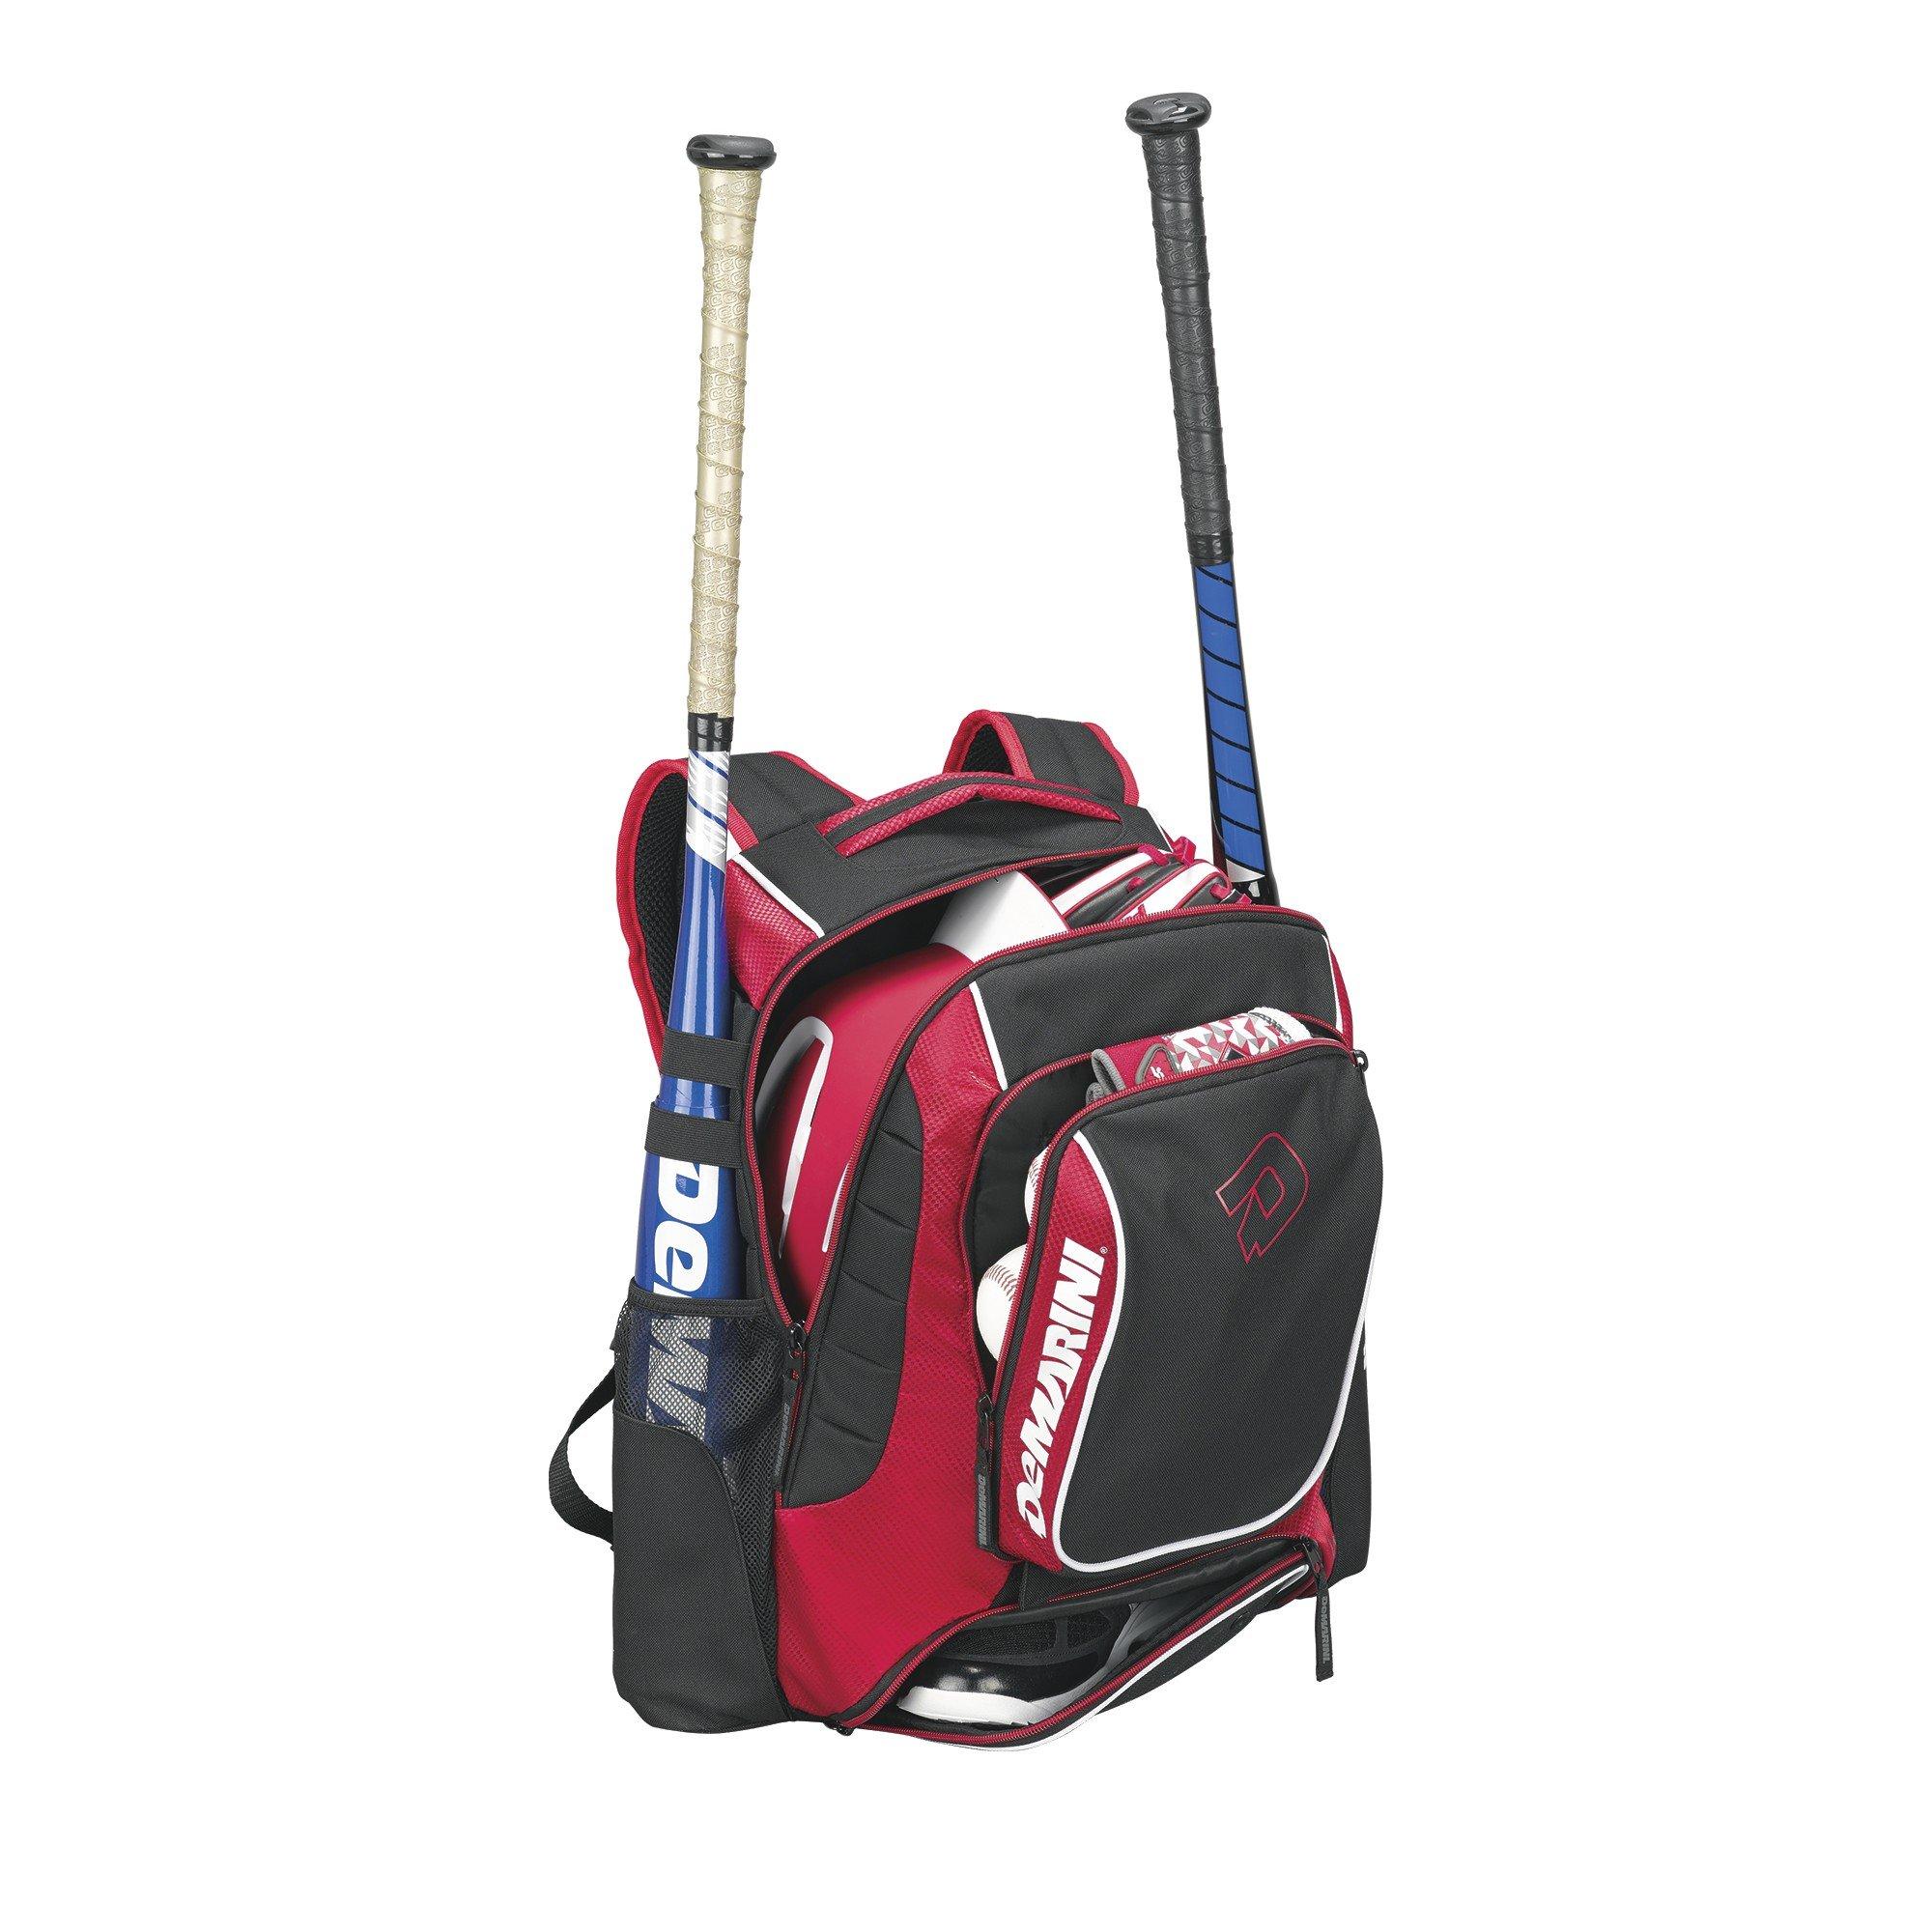 DeMarini WTD9407SC Momentum Backpack, Scarlet by DeMarini (Image #2)